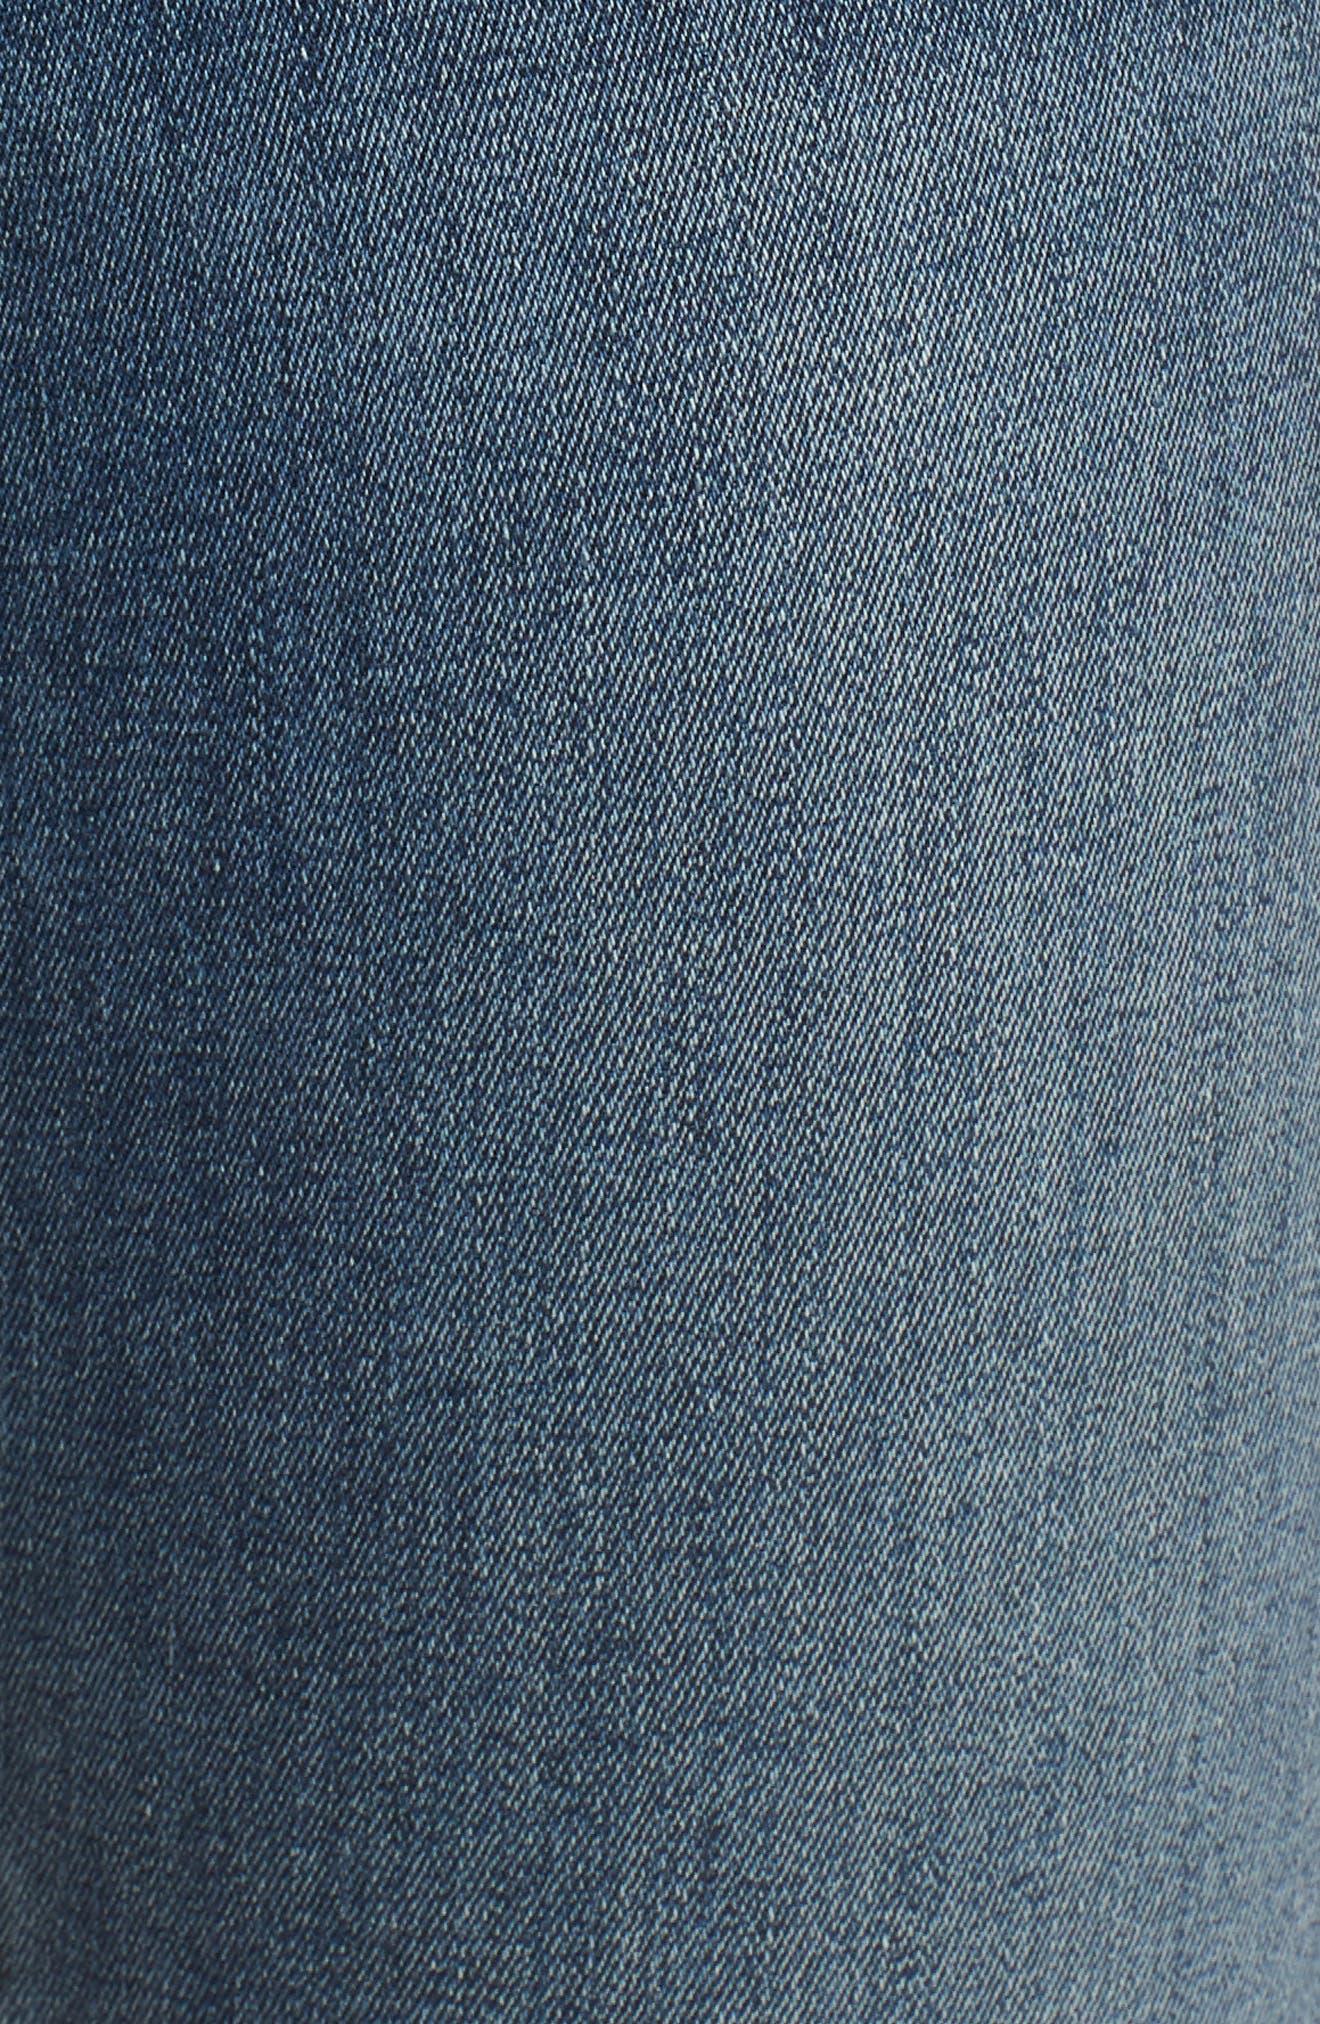 Lolita Skinny Cropped Denim Jeans,                             Alternate thumbnail 6, color,                             420